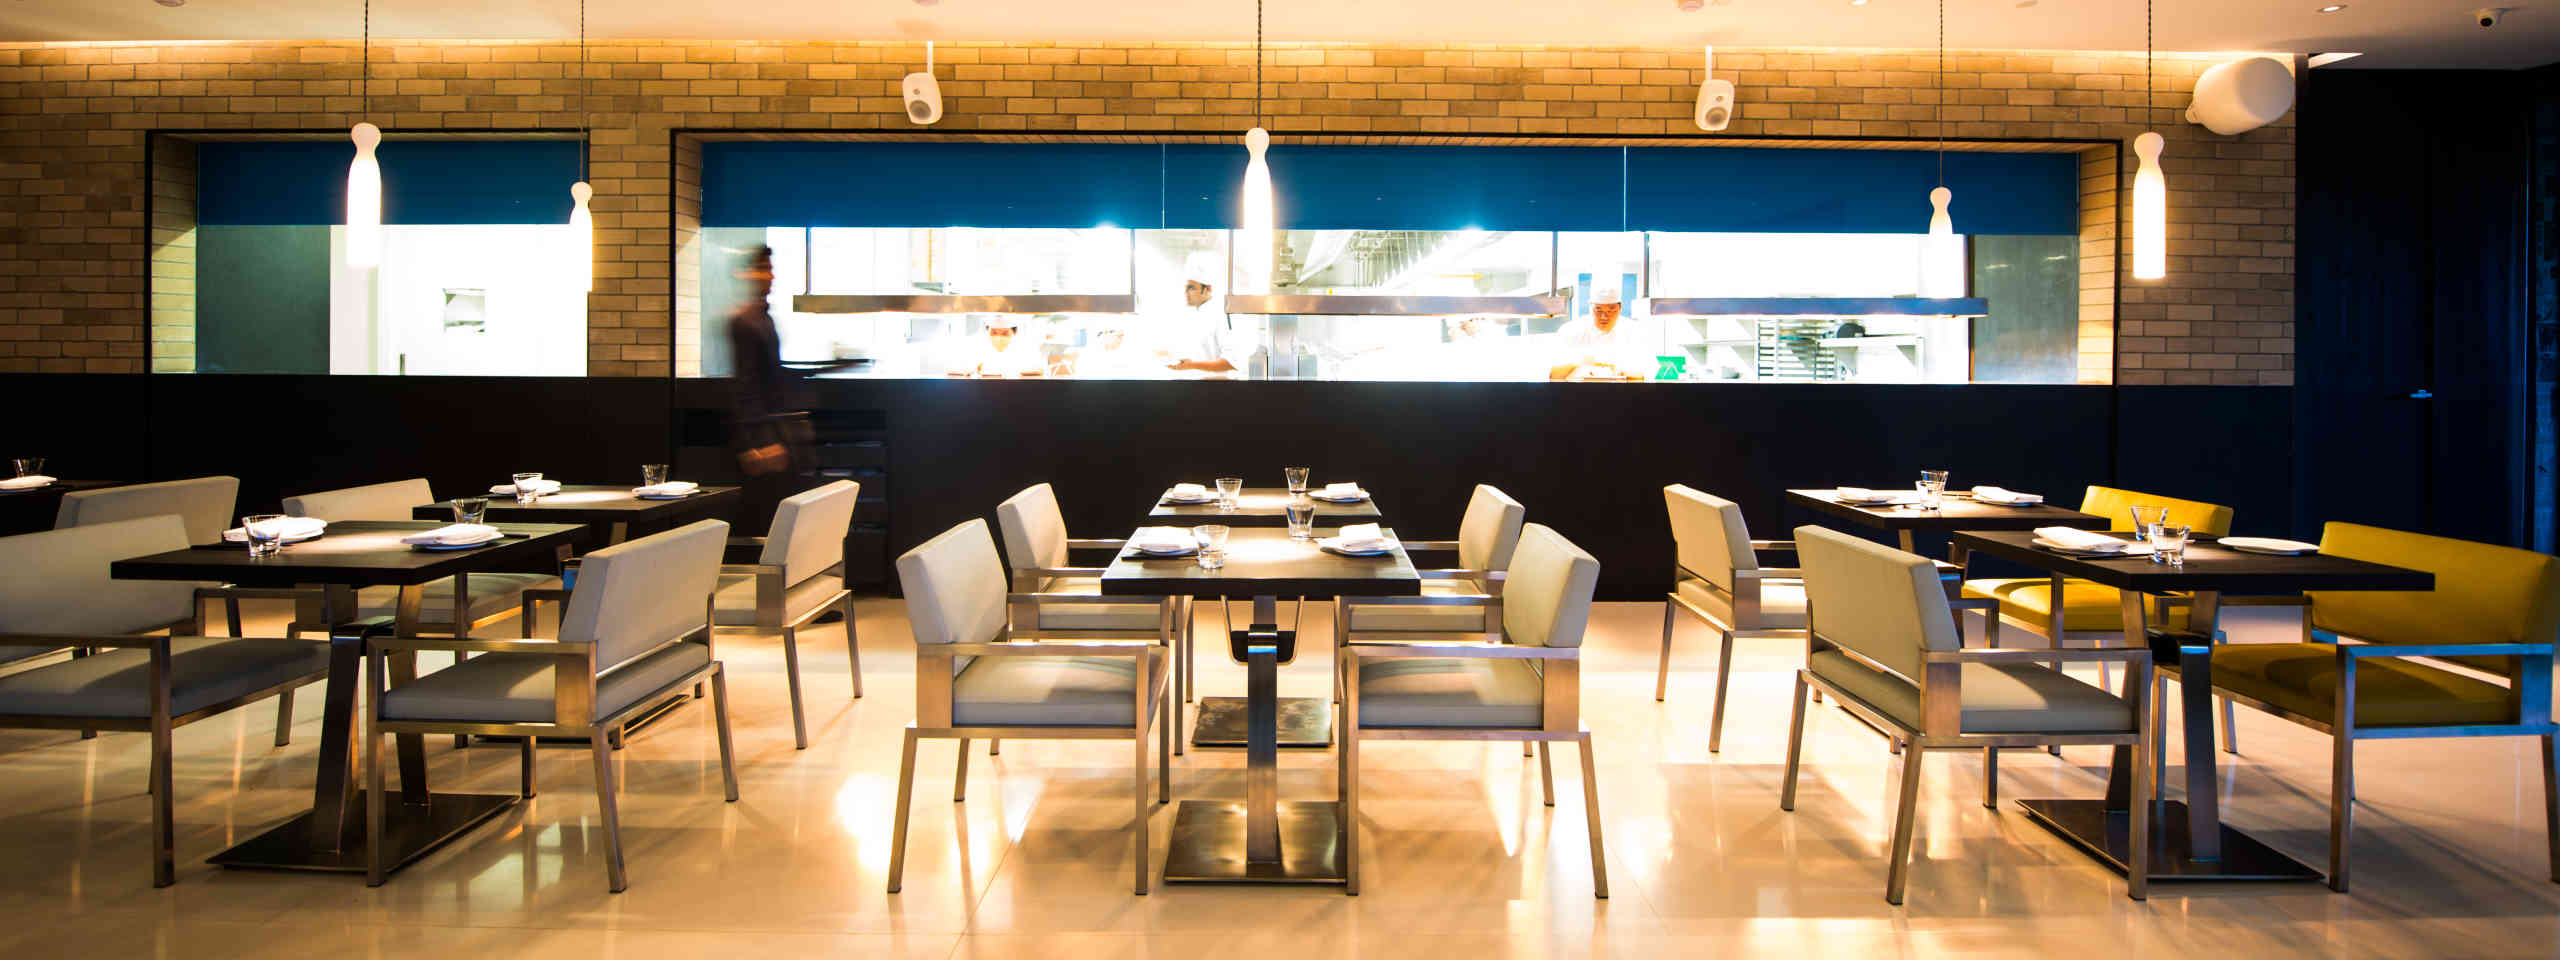 Yauatcha Bengaluru Dining Room